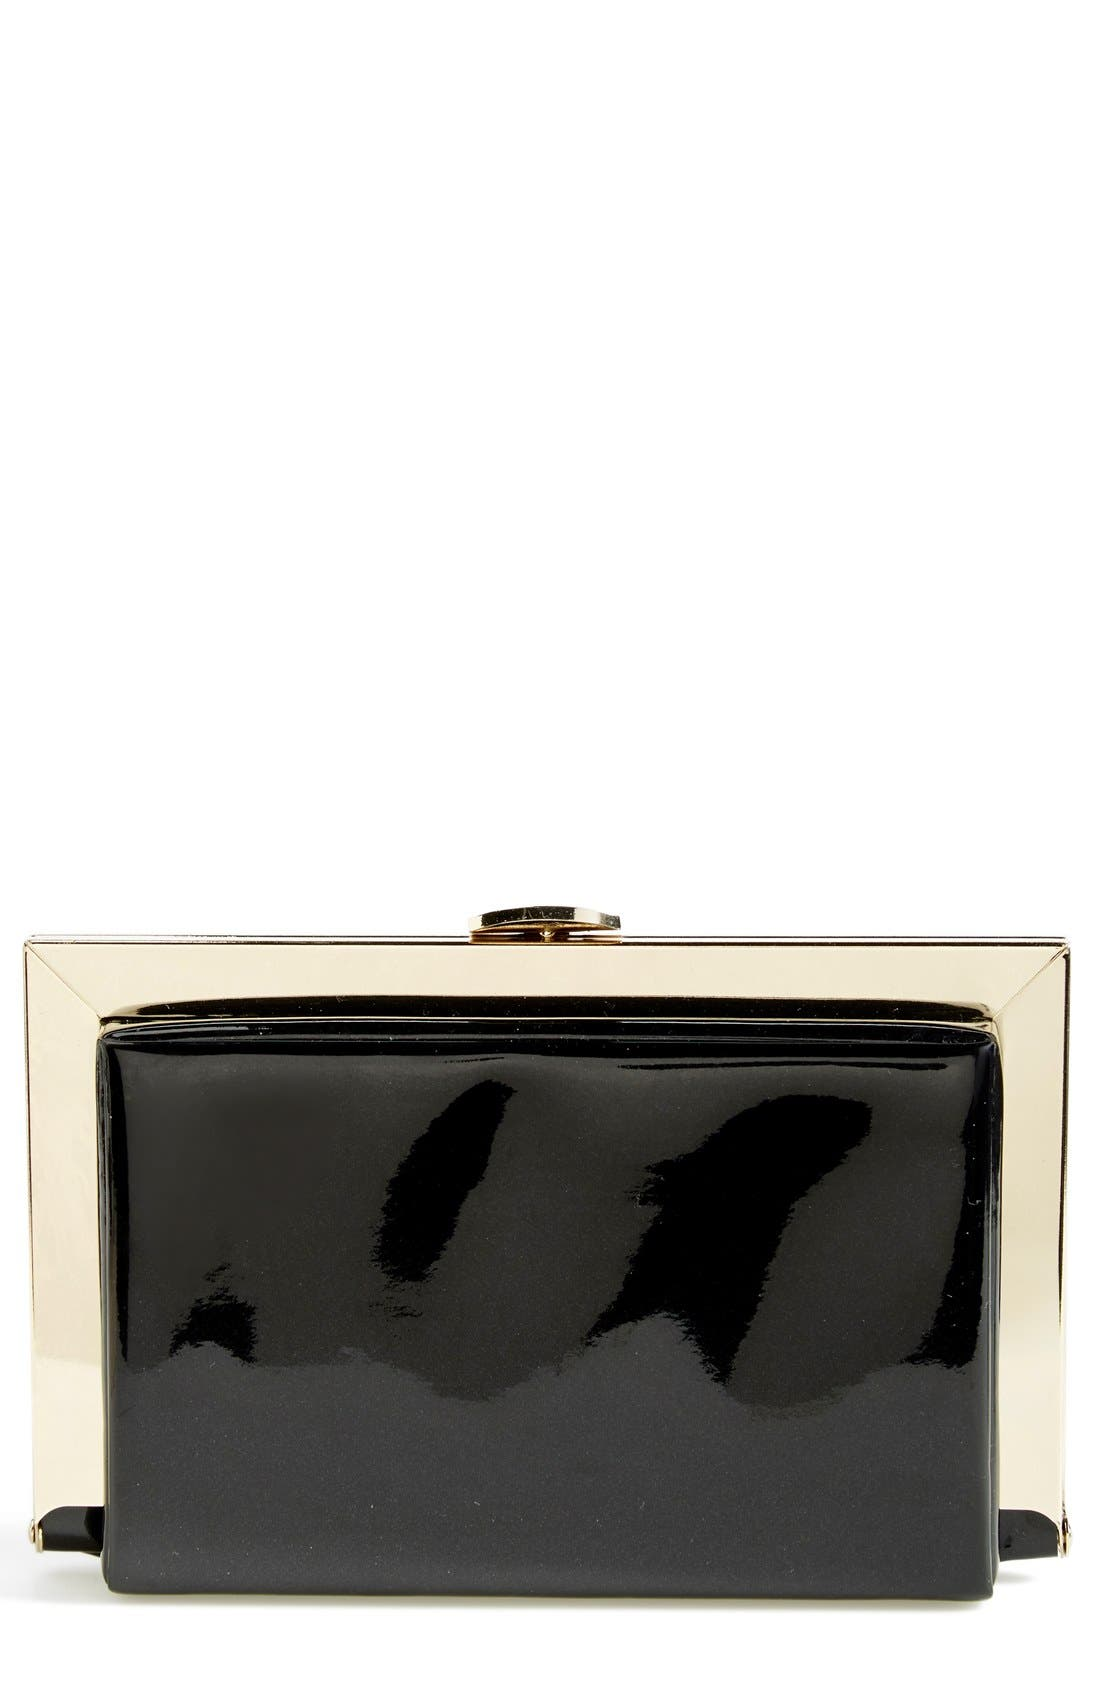 Main Image - Natasha Couture Patent Framed Box Clutch